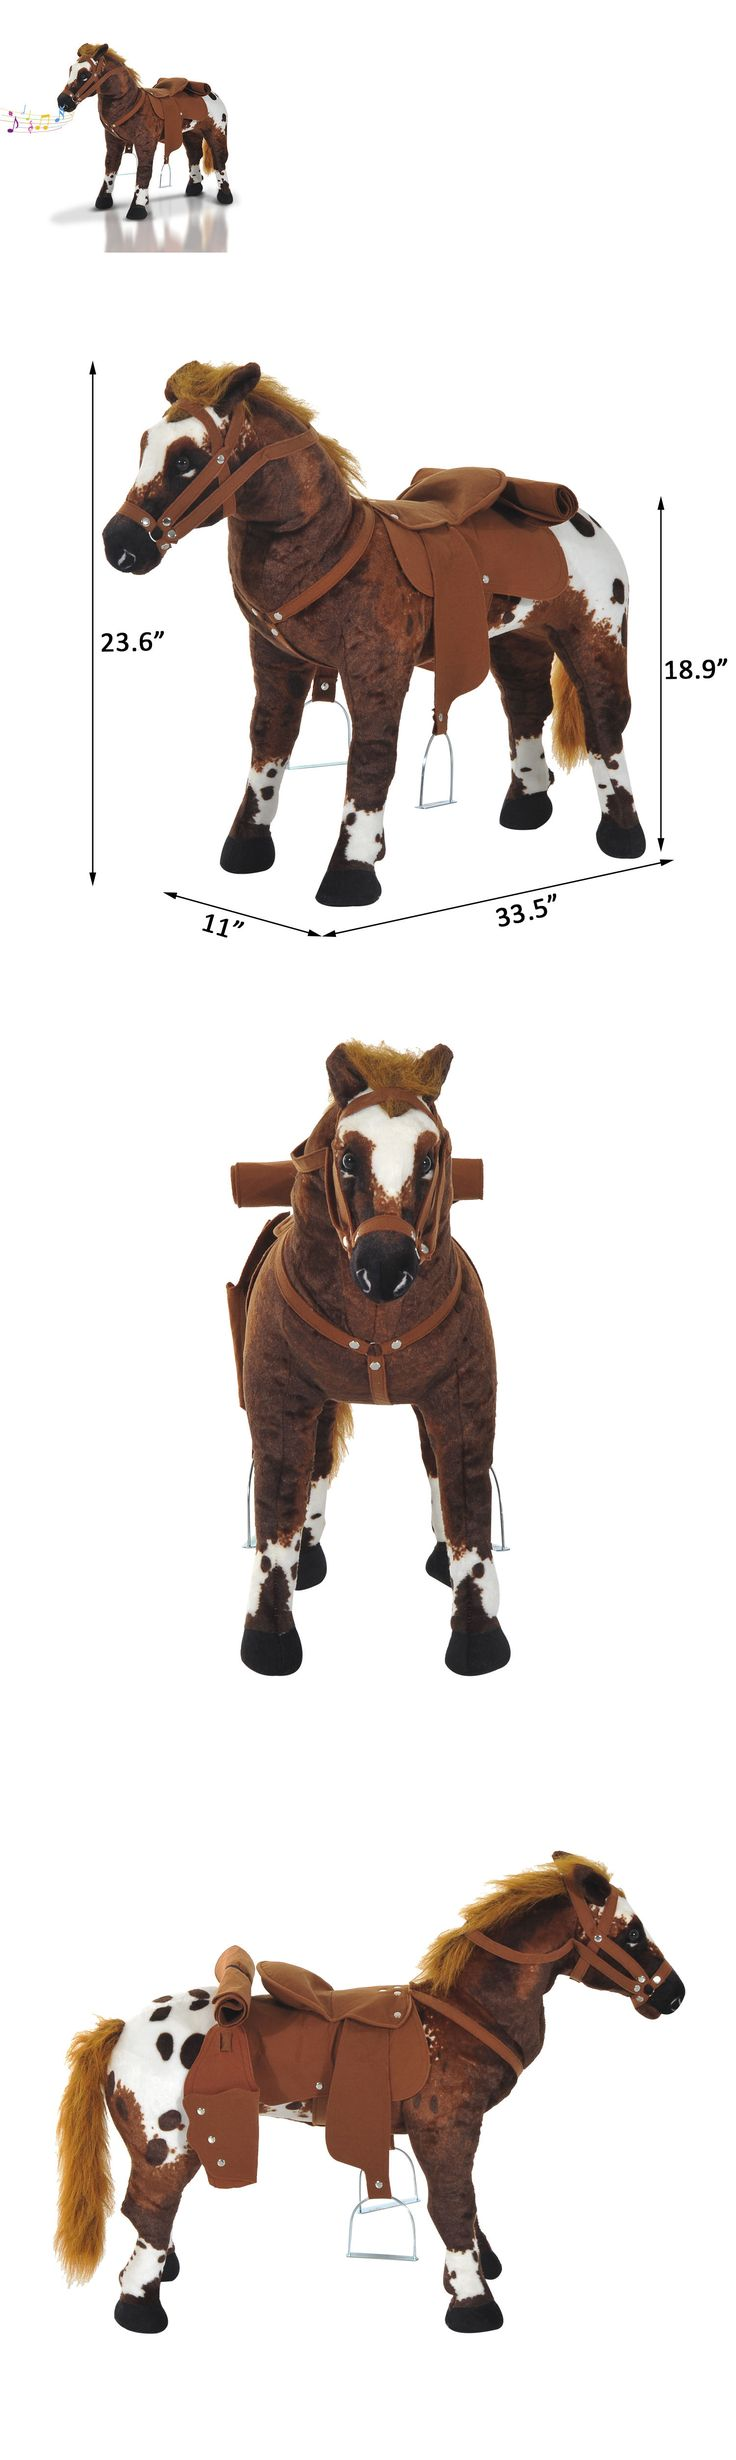 Rocking Horses 19024: Qaba Children Cowboy Standing Plush Horse Soft Ride On Toy Cuddly Pony W Sound -> BUY IT NOW ONLY: $65.99 on eBay!